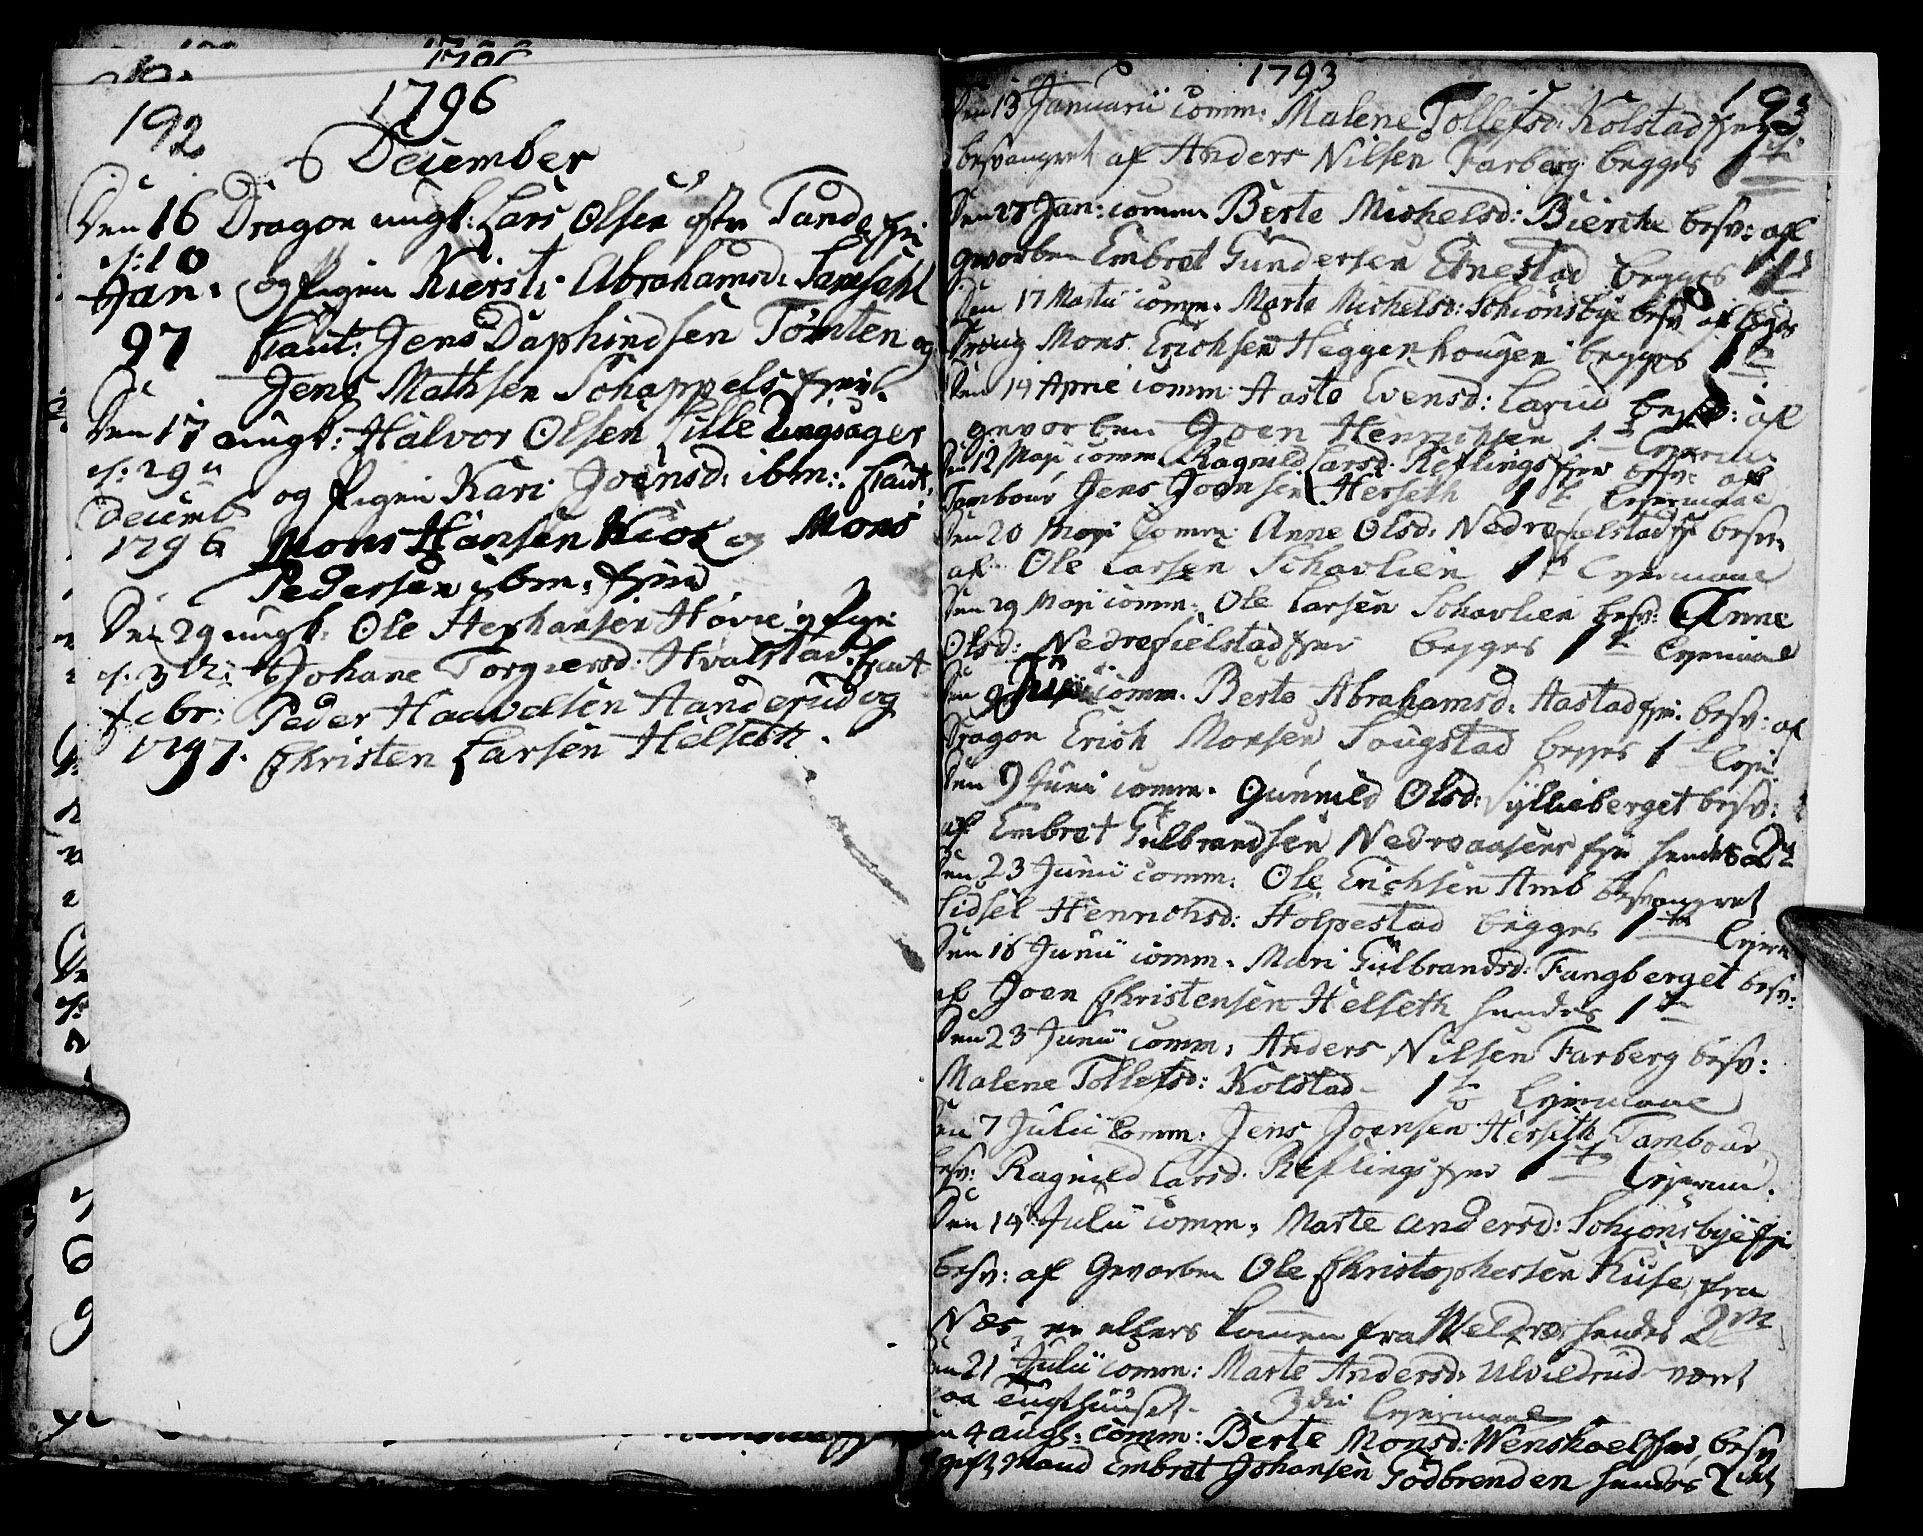 SAH, Ringsaker prestekontor, I/Ia/L0005/0006: Kladd til kirkebok nr. 1F, 1793-1796, s. 192-193